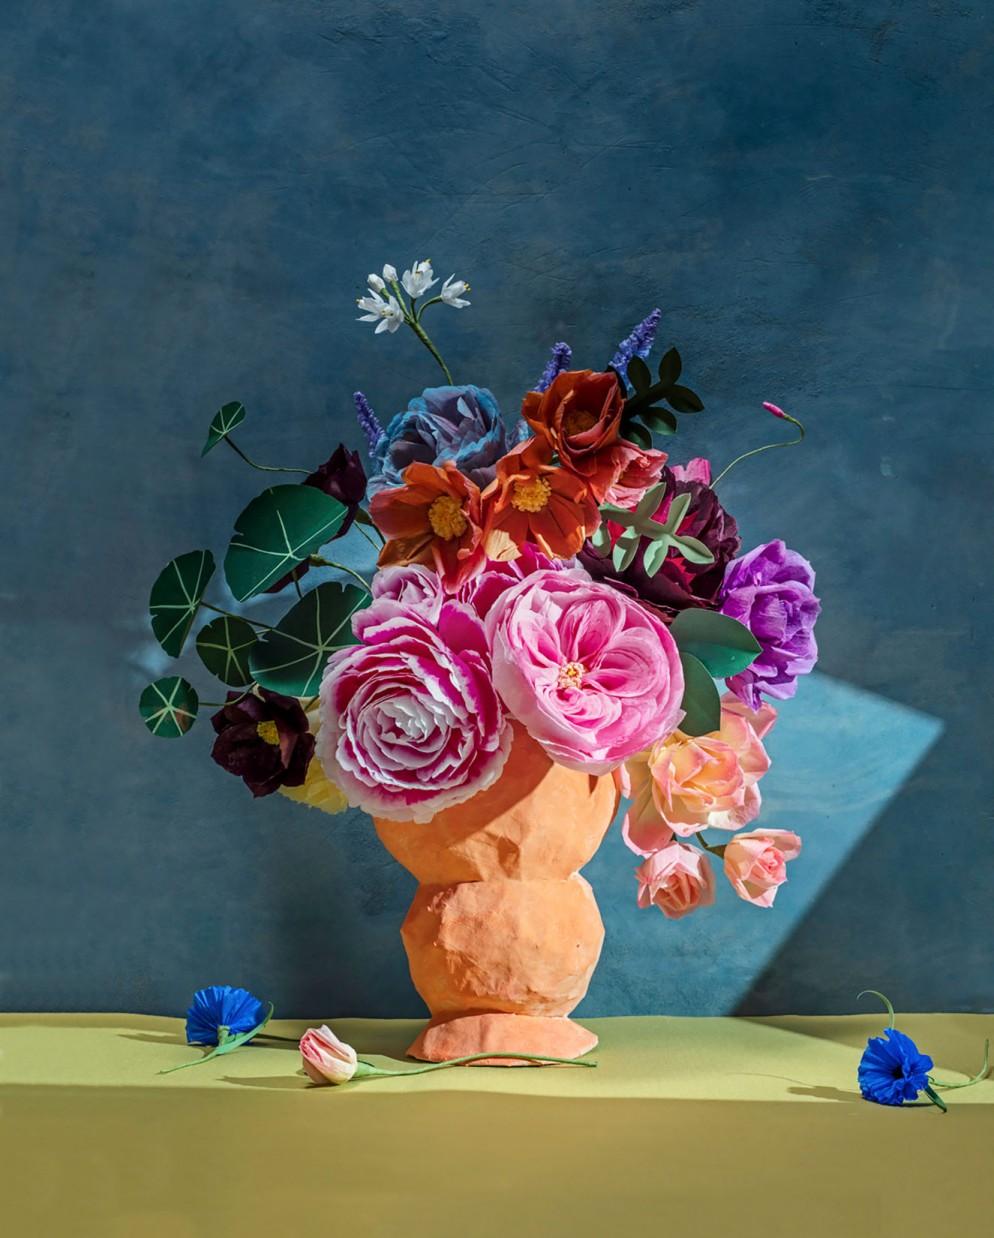 fiori-carta-fiori-secchi-pressati-flower-designer-02